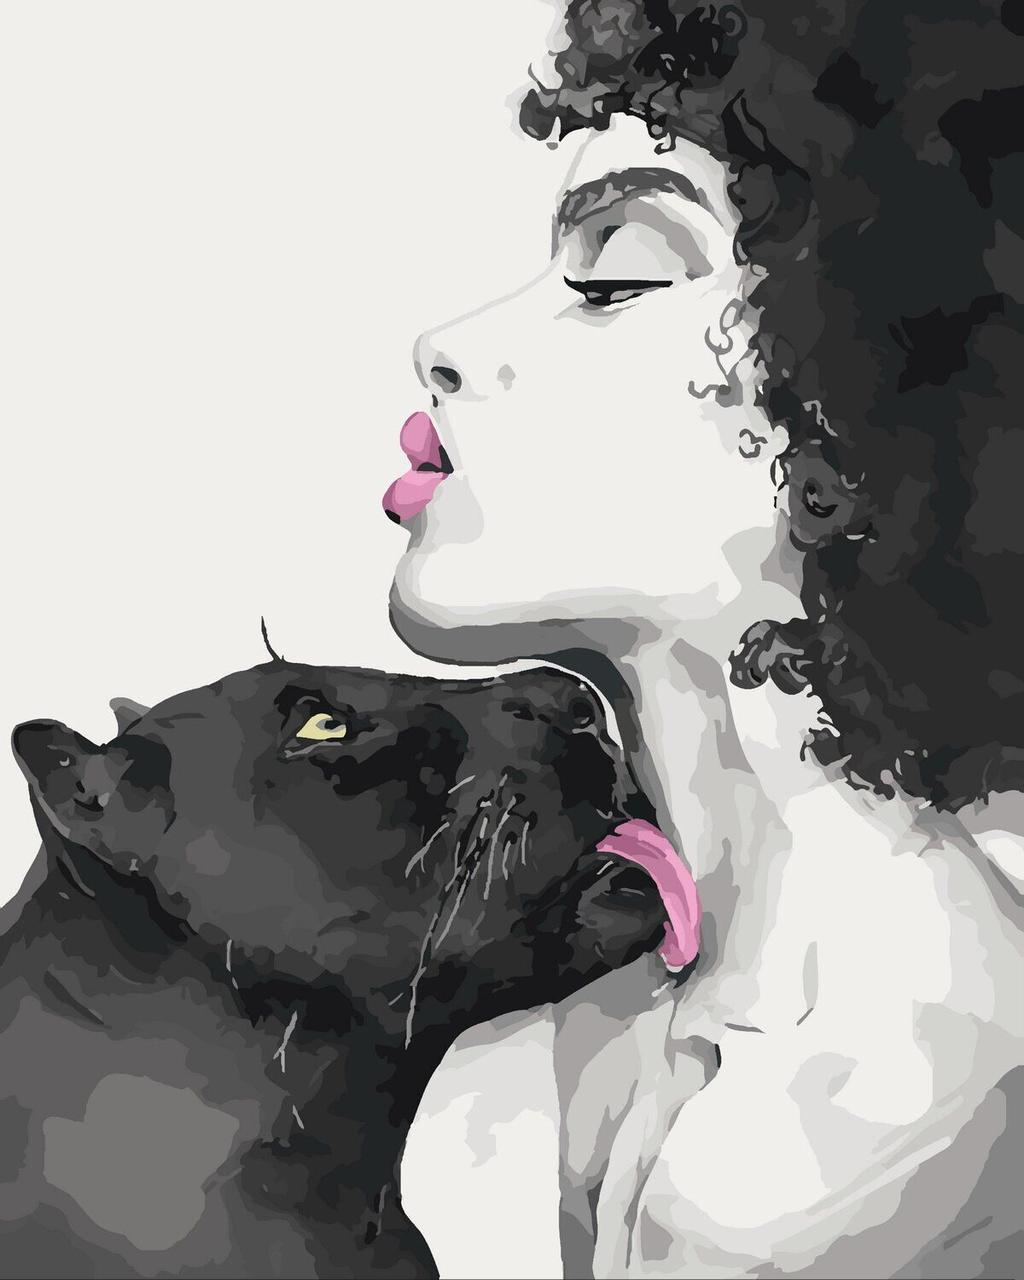 КНО4506 Раскраска по номерам Поцелуй пантеры, Без коробки